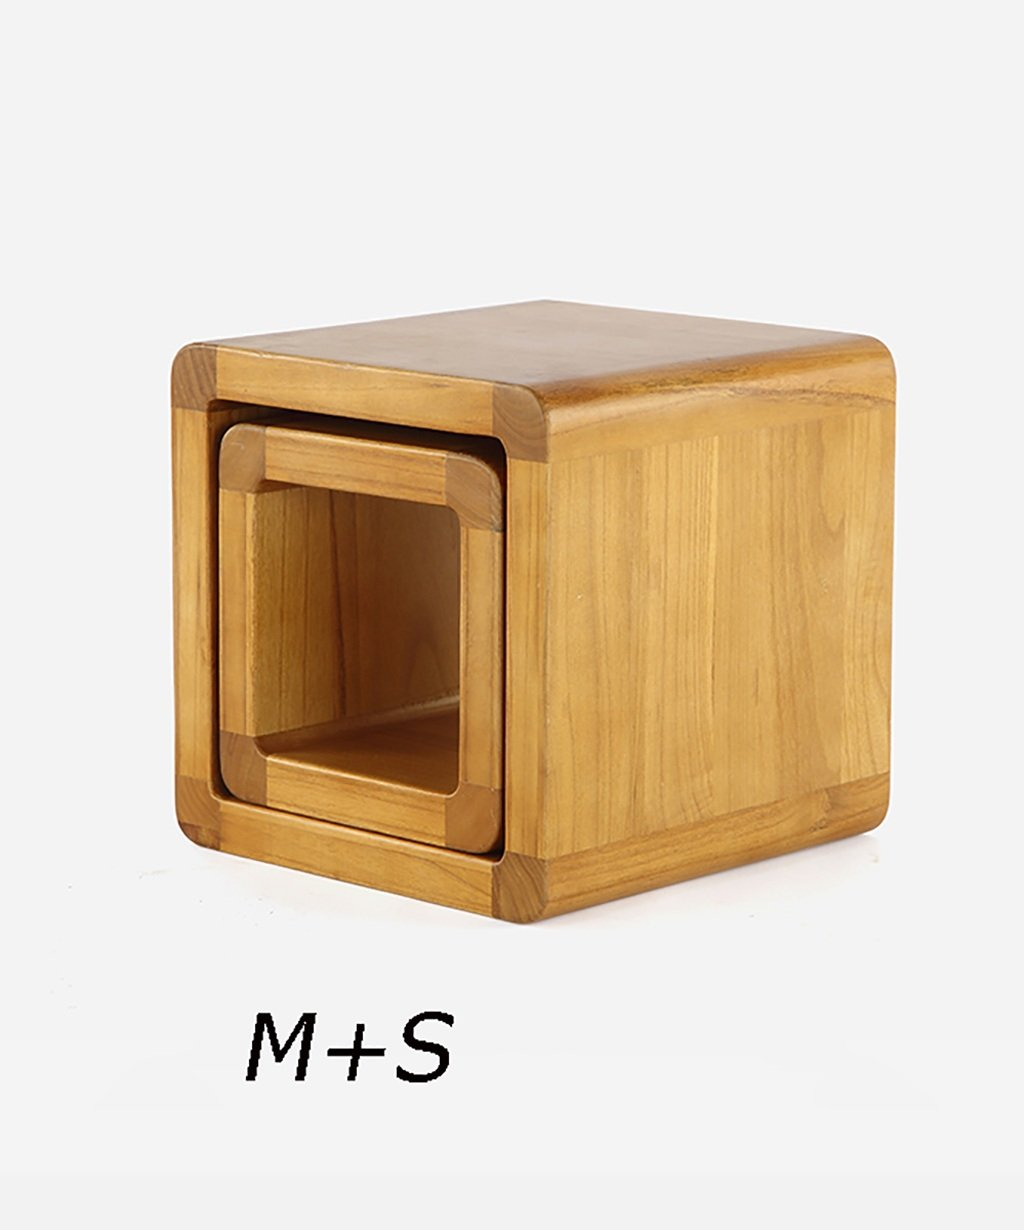 Farbe : Holzfarbe, gr/ö/ße : S+No.6 Basket Mehrfarbig optional WUFENG Multifunktions-Paulownia Holz Hocker W/ürfel Bank